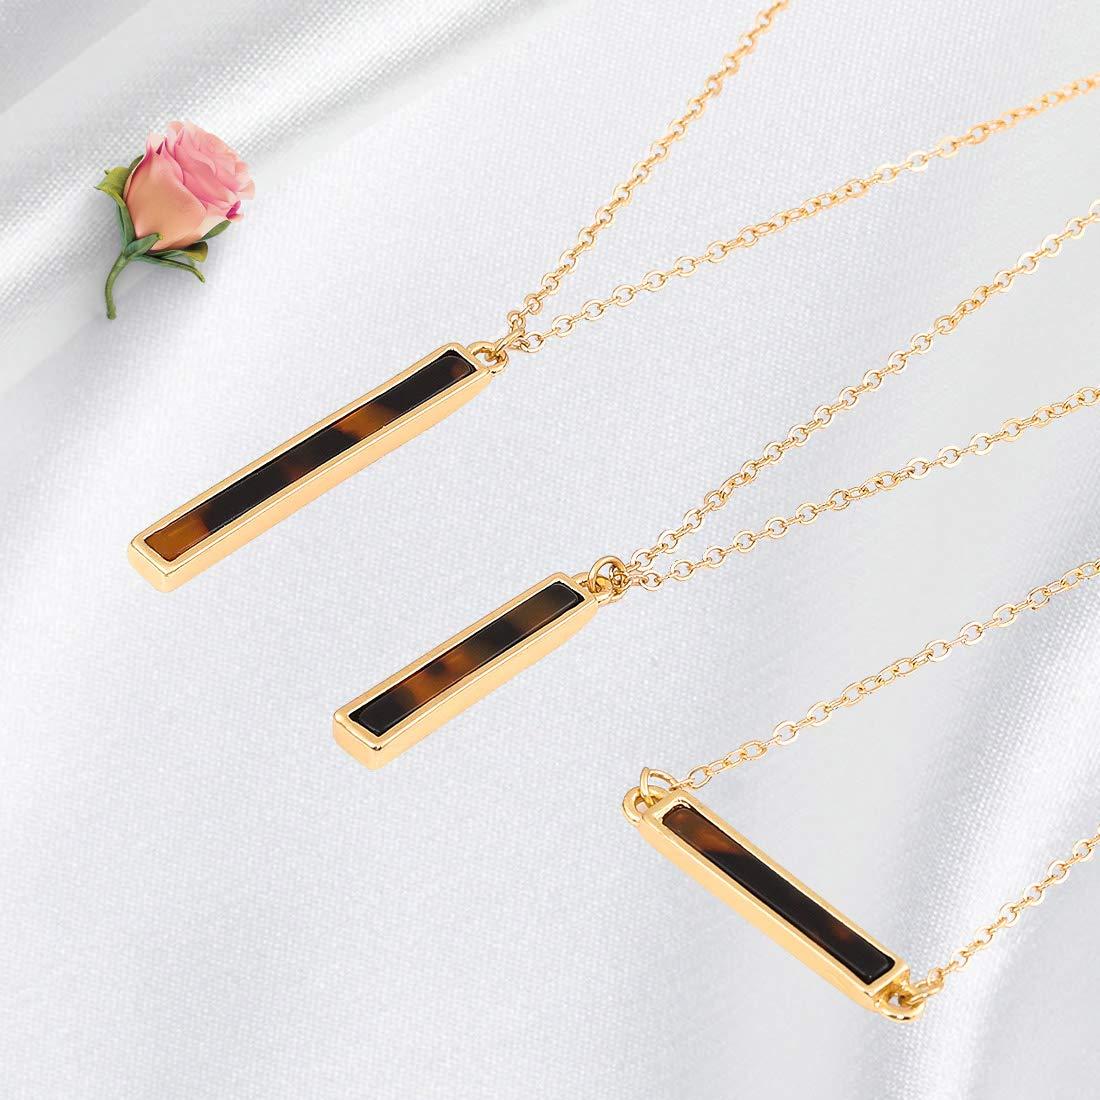 2PC Gold Boho Stick Bar Choker Necklace Minimalist Y Necklace for Women Boho Stick Bar Choker Necklace Minimalist Y Necklace for Women ALEXY Multilayer Bar Pendant Necklace